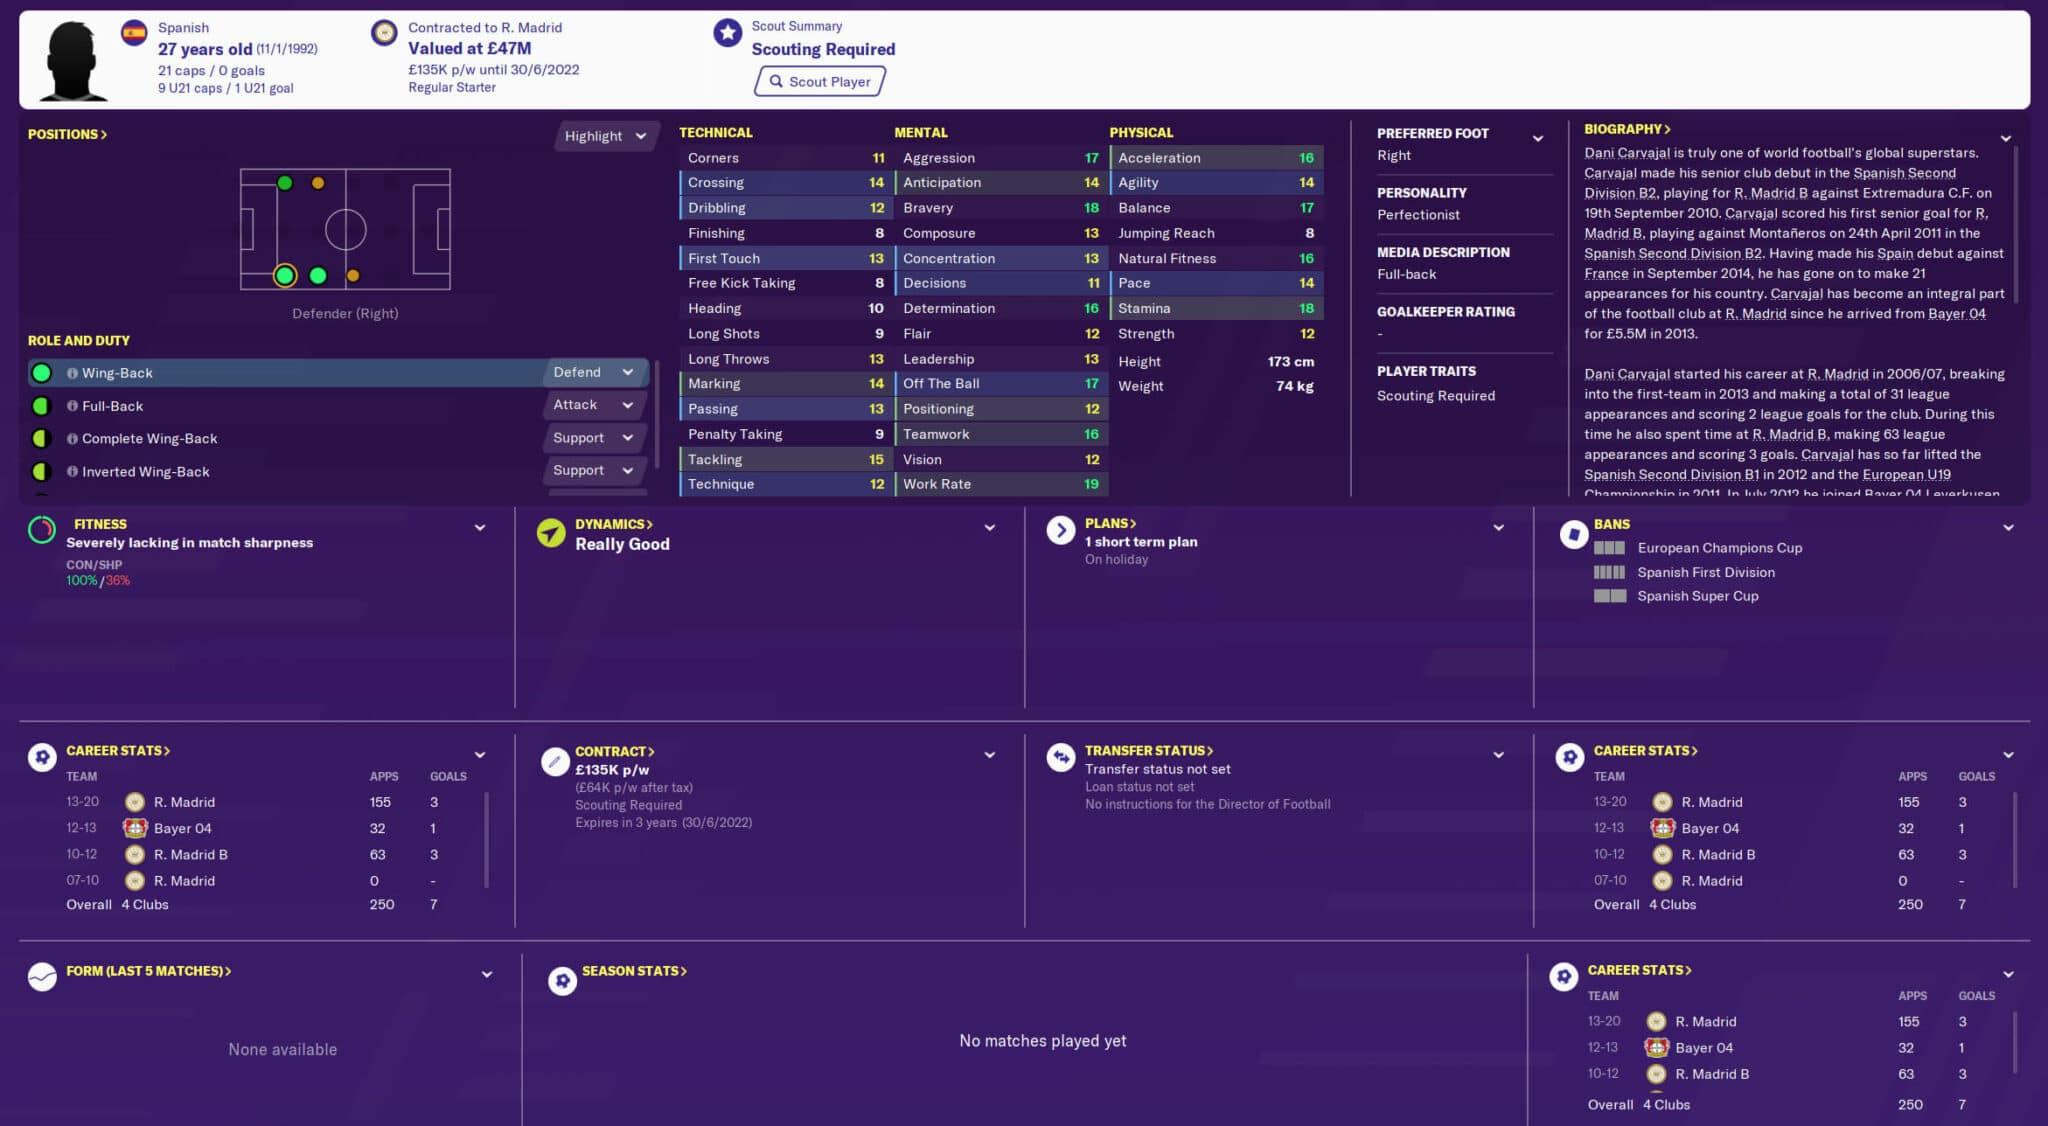 fm20 carvajal Football Manager 2020 Best Players